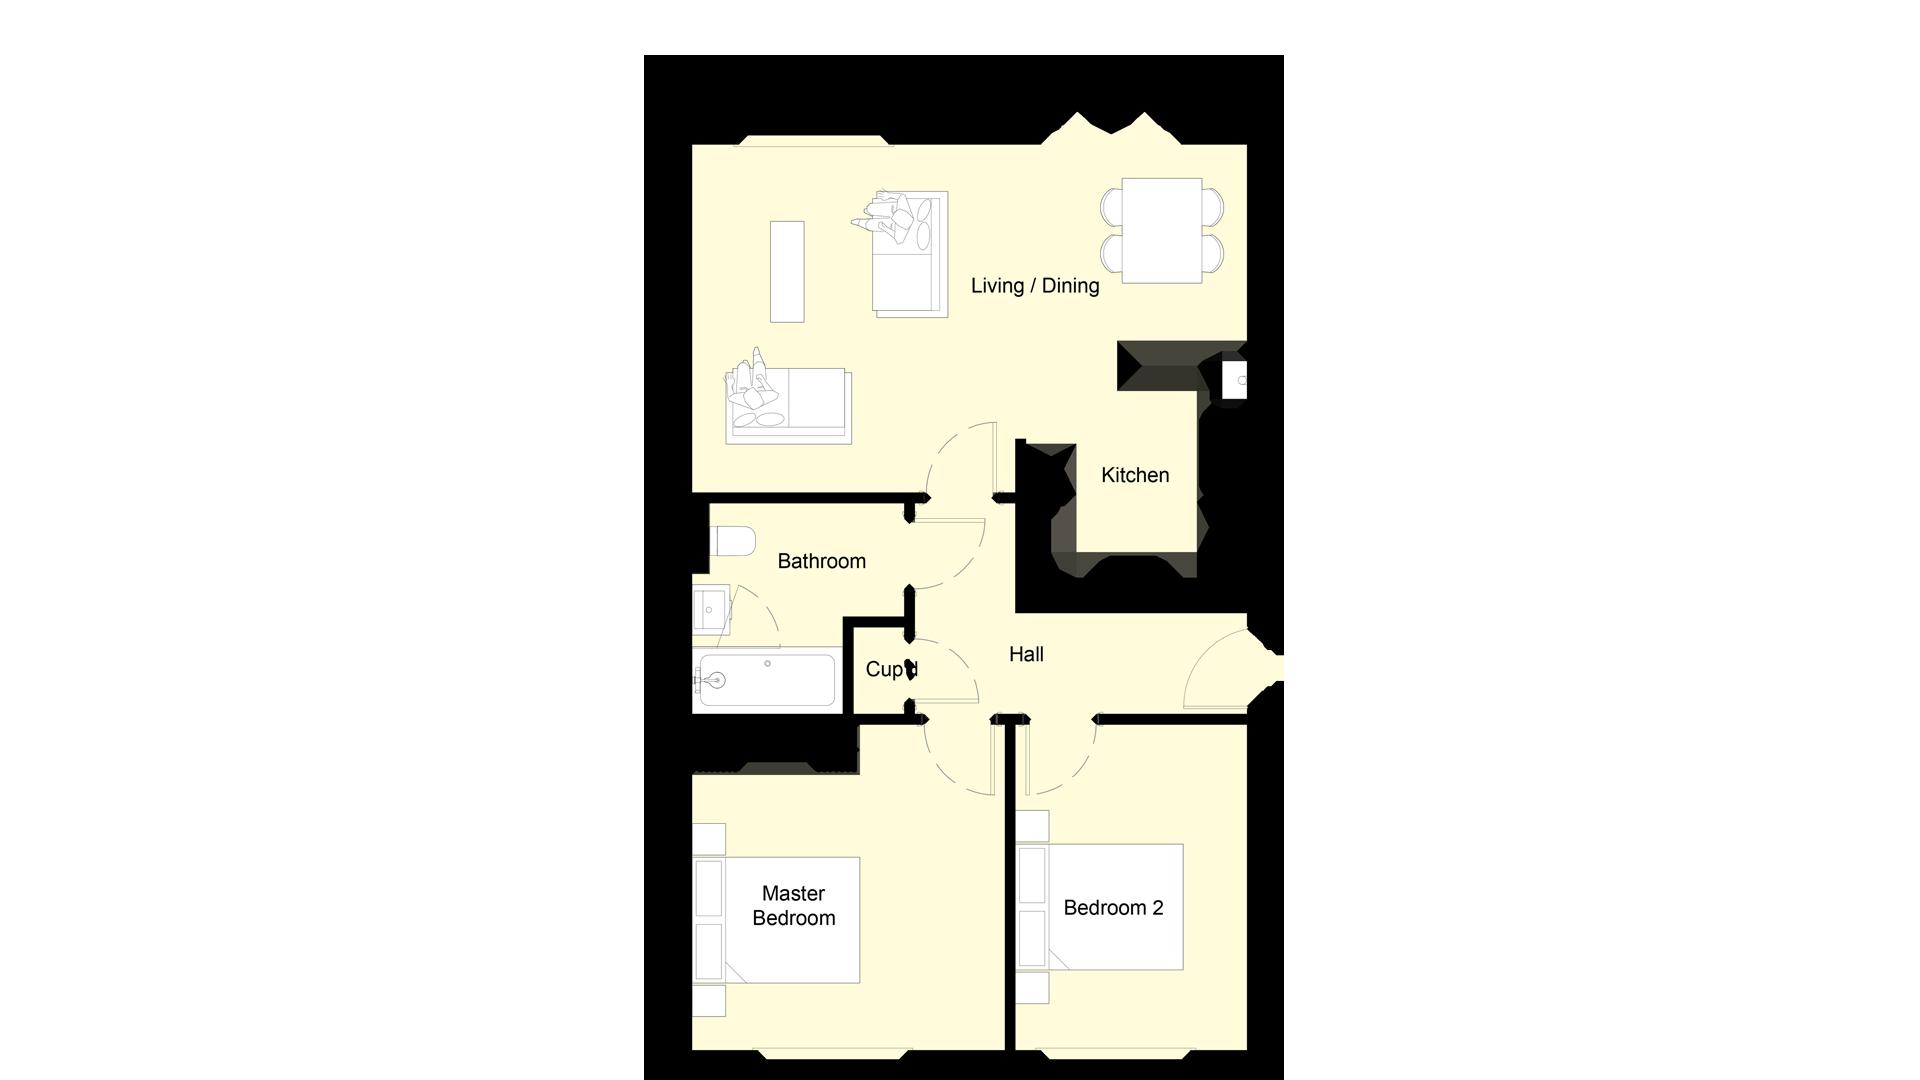 Layout of the ground floor at Churchfields plot 6